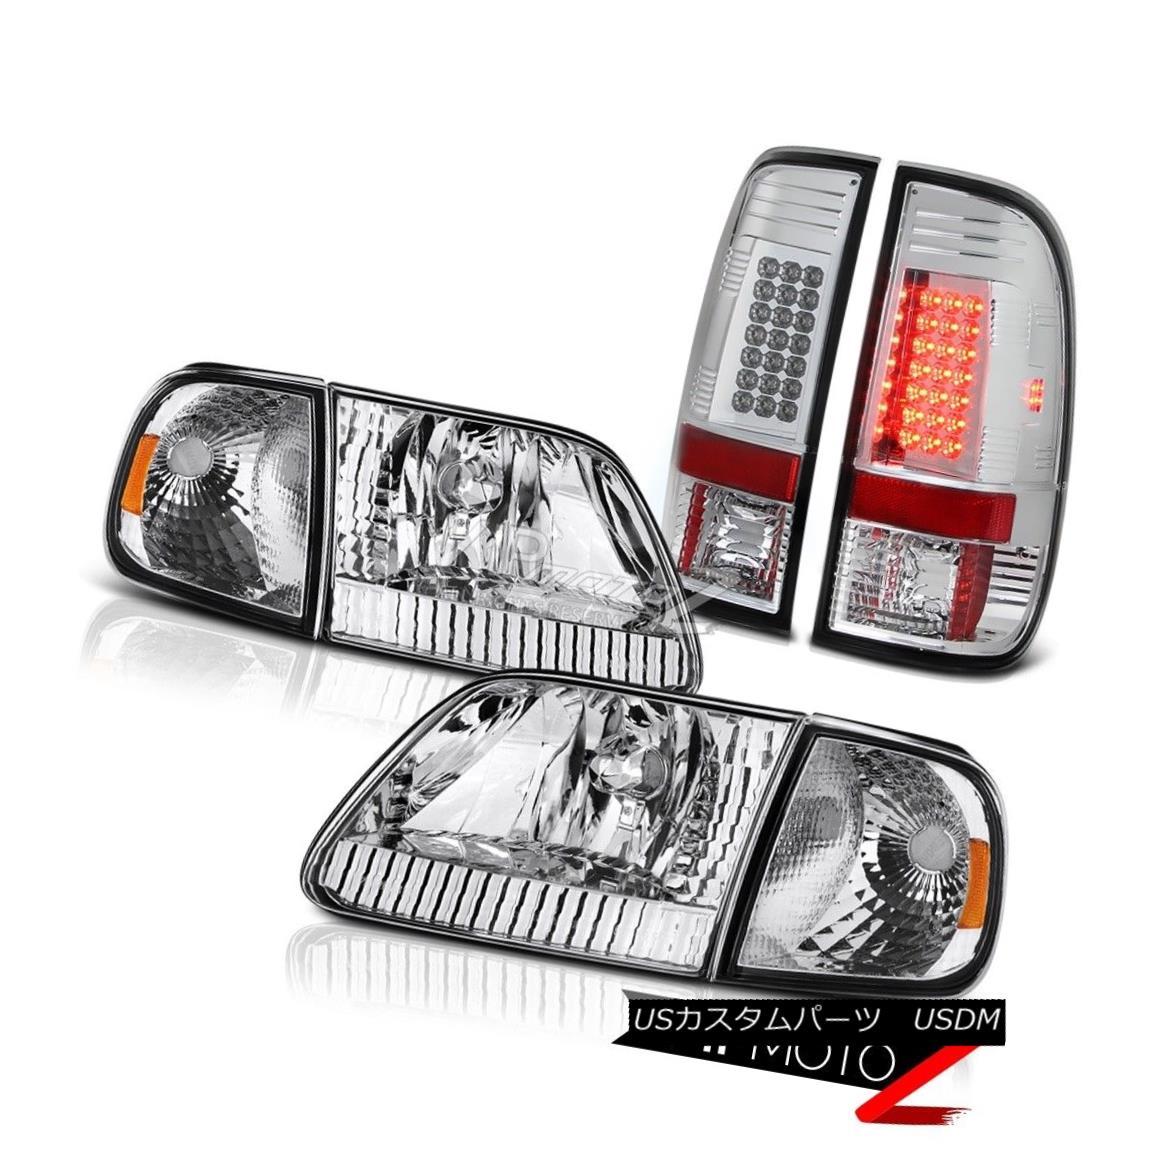 BRIGHT」LEDテールライト XLユーロクローム信号ヘッドライト「ULTRA Headlights Signal 1997-2003 Chrome Lights F150 XL BRIGHT